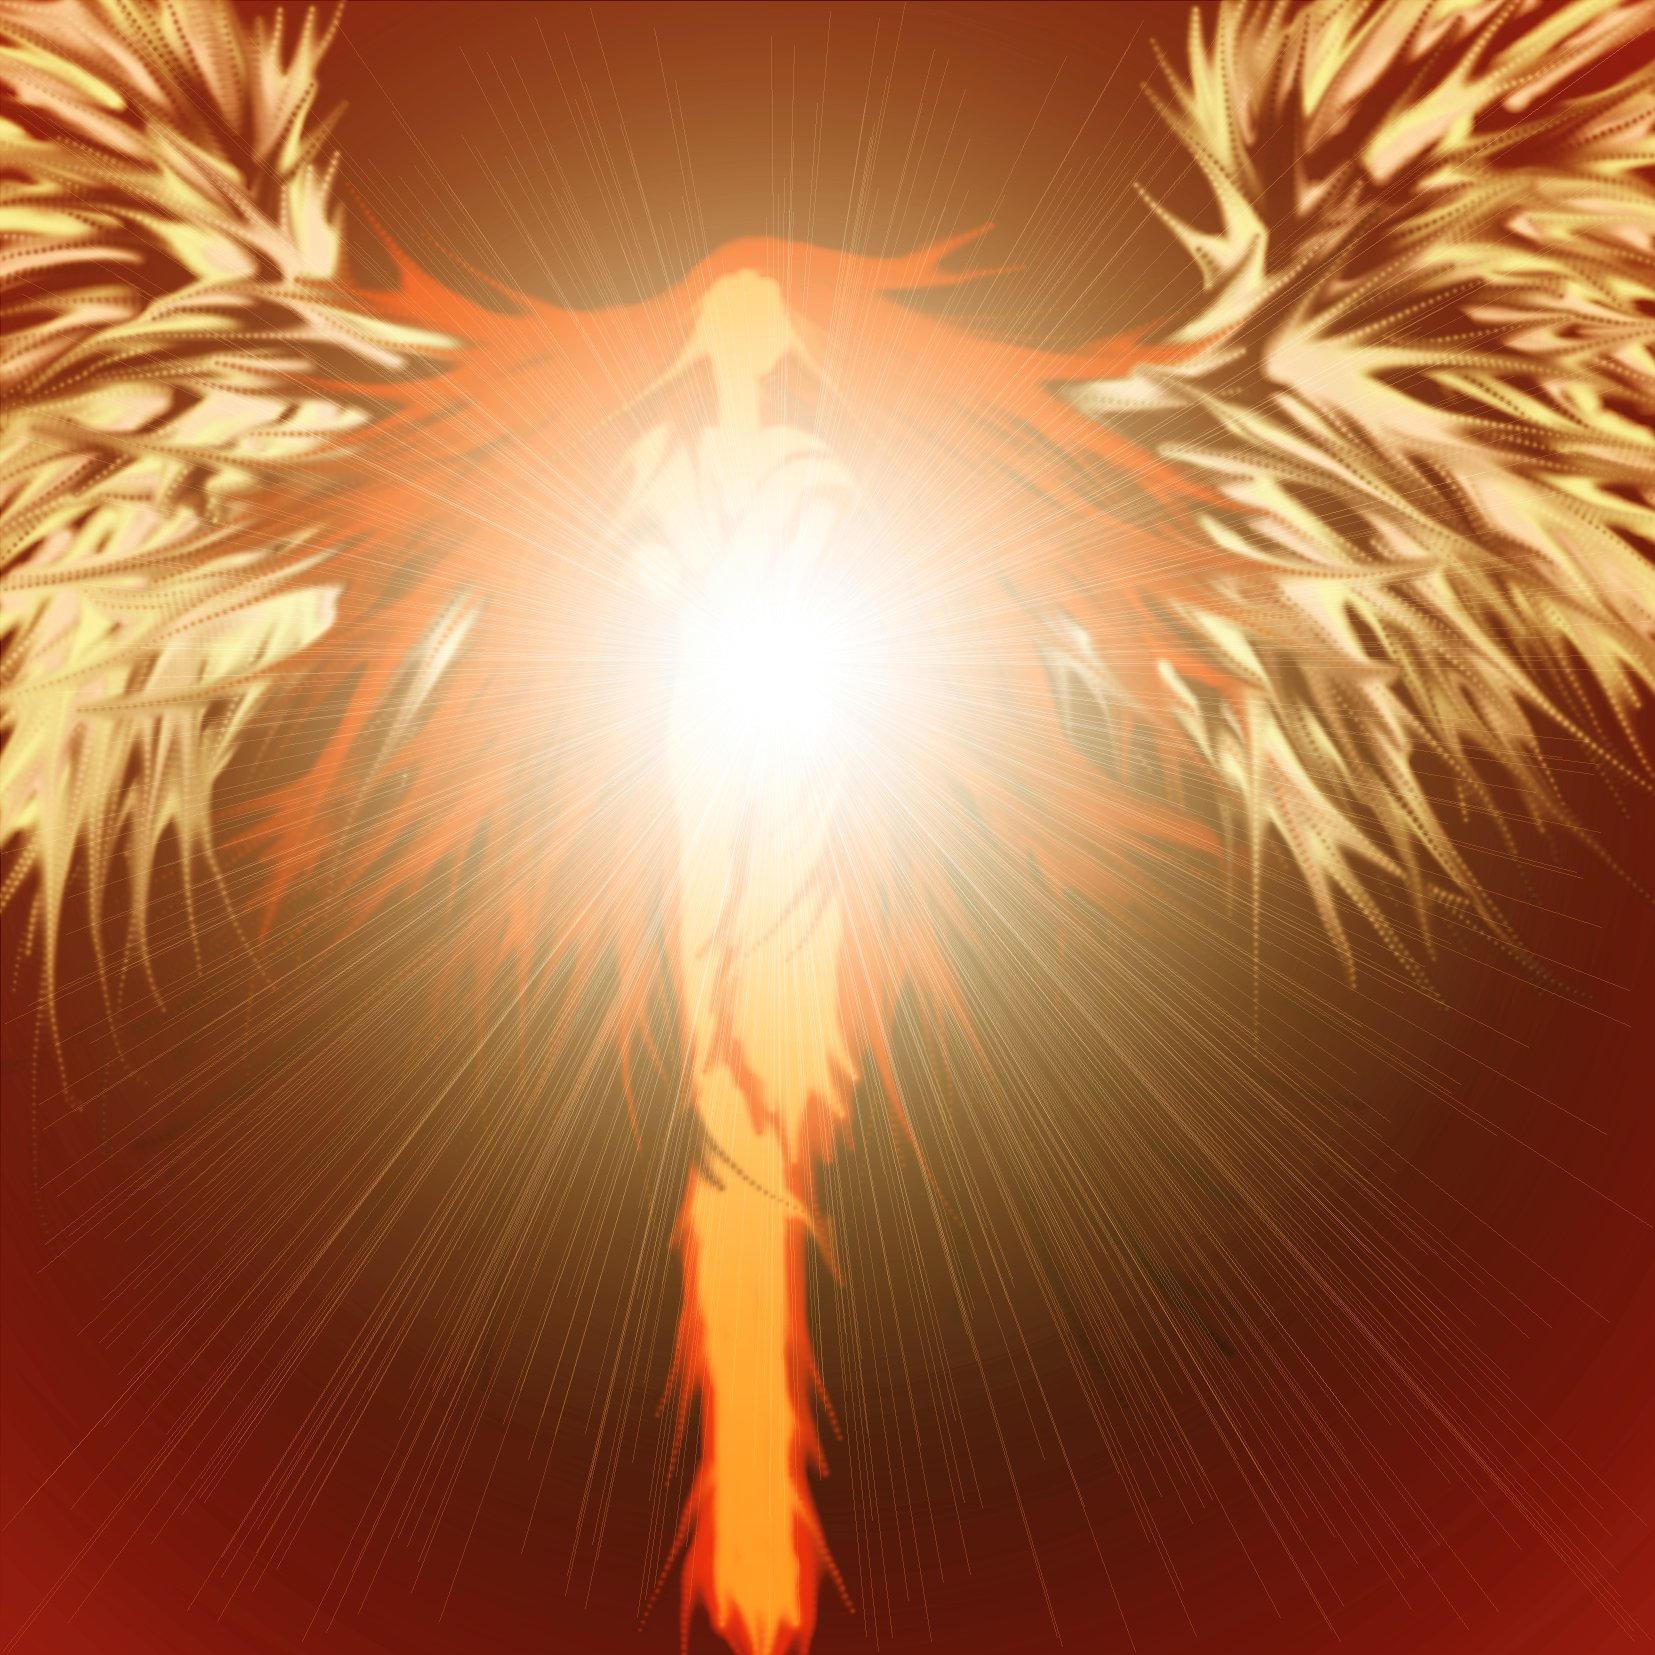 Fire angel by Touda-san